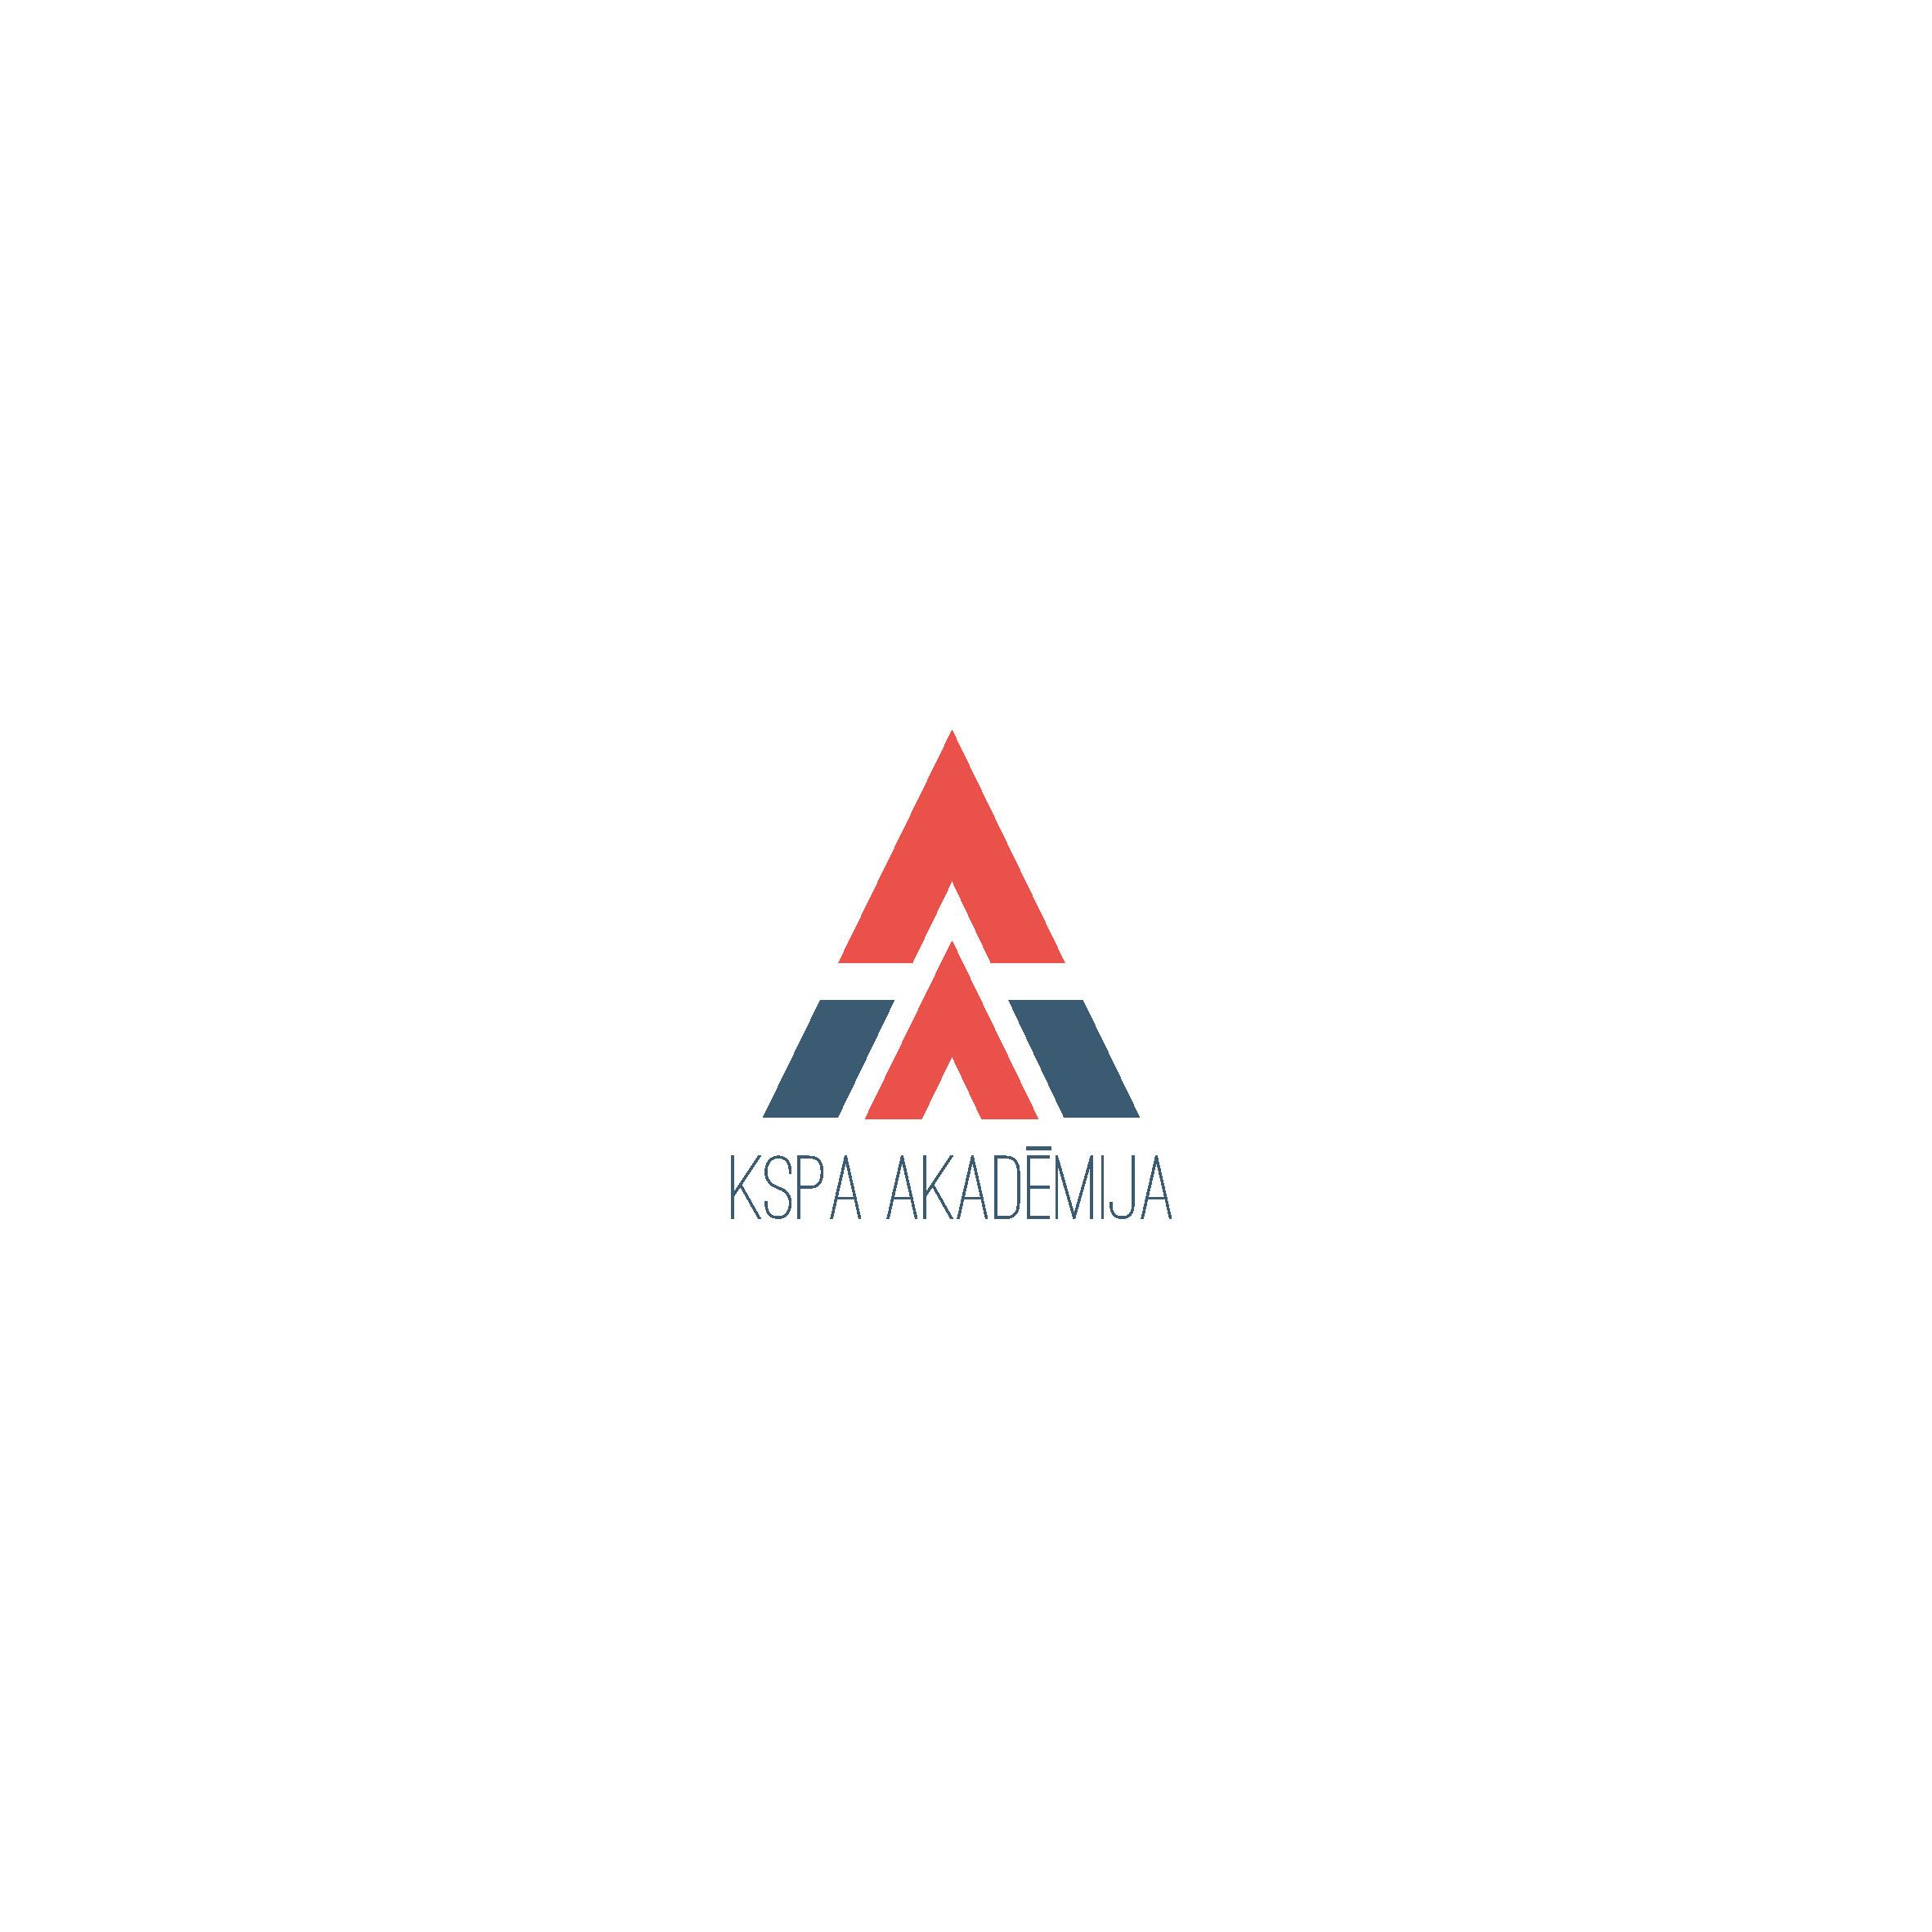 logotipa dizaina izstrāde, Logo Design Development, Разработка дизайна логотипа